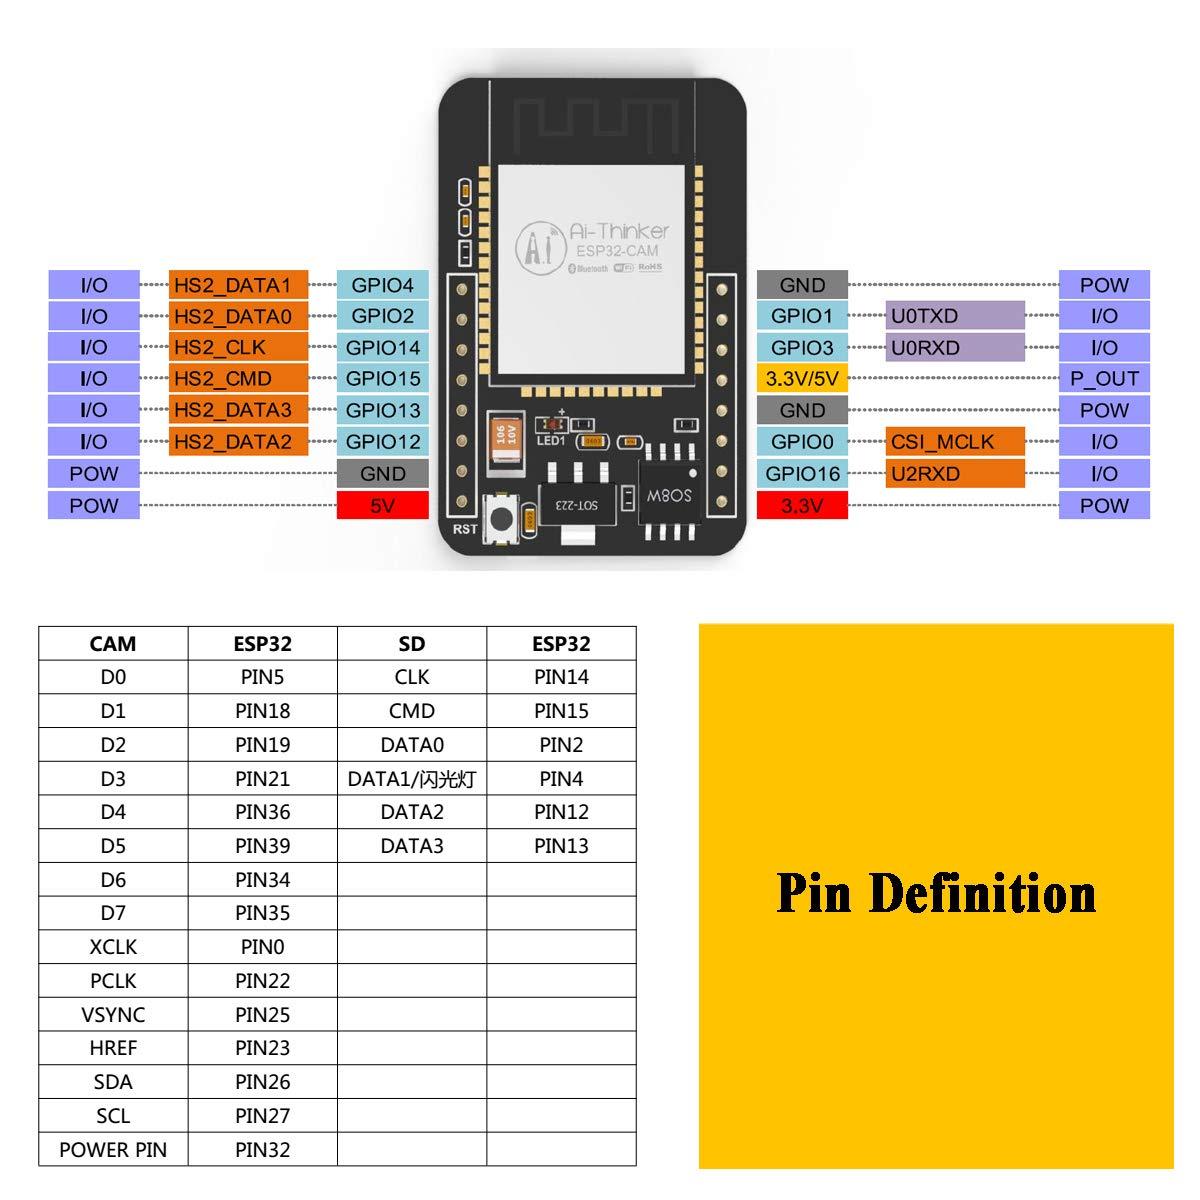 ESP32 Camera WiFi+Bluetooth Module 4M PSRAM ESP32 5V Low-Power Dual-core  32-bit CPU, with OV2640 2 Million Pixels Camera for Home Smart Device Map,